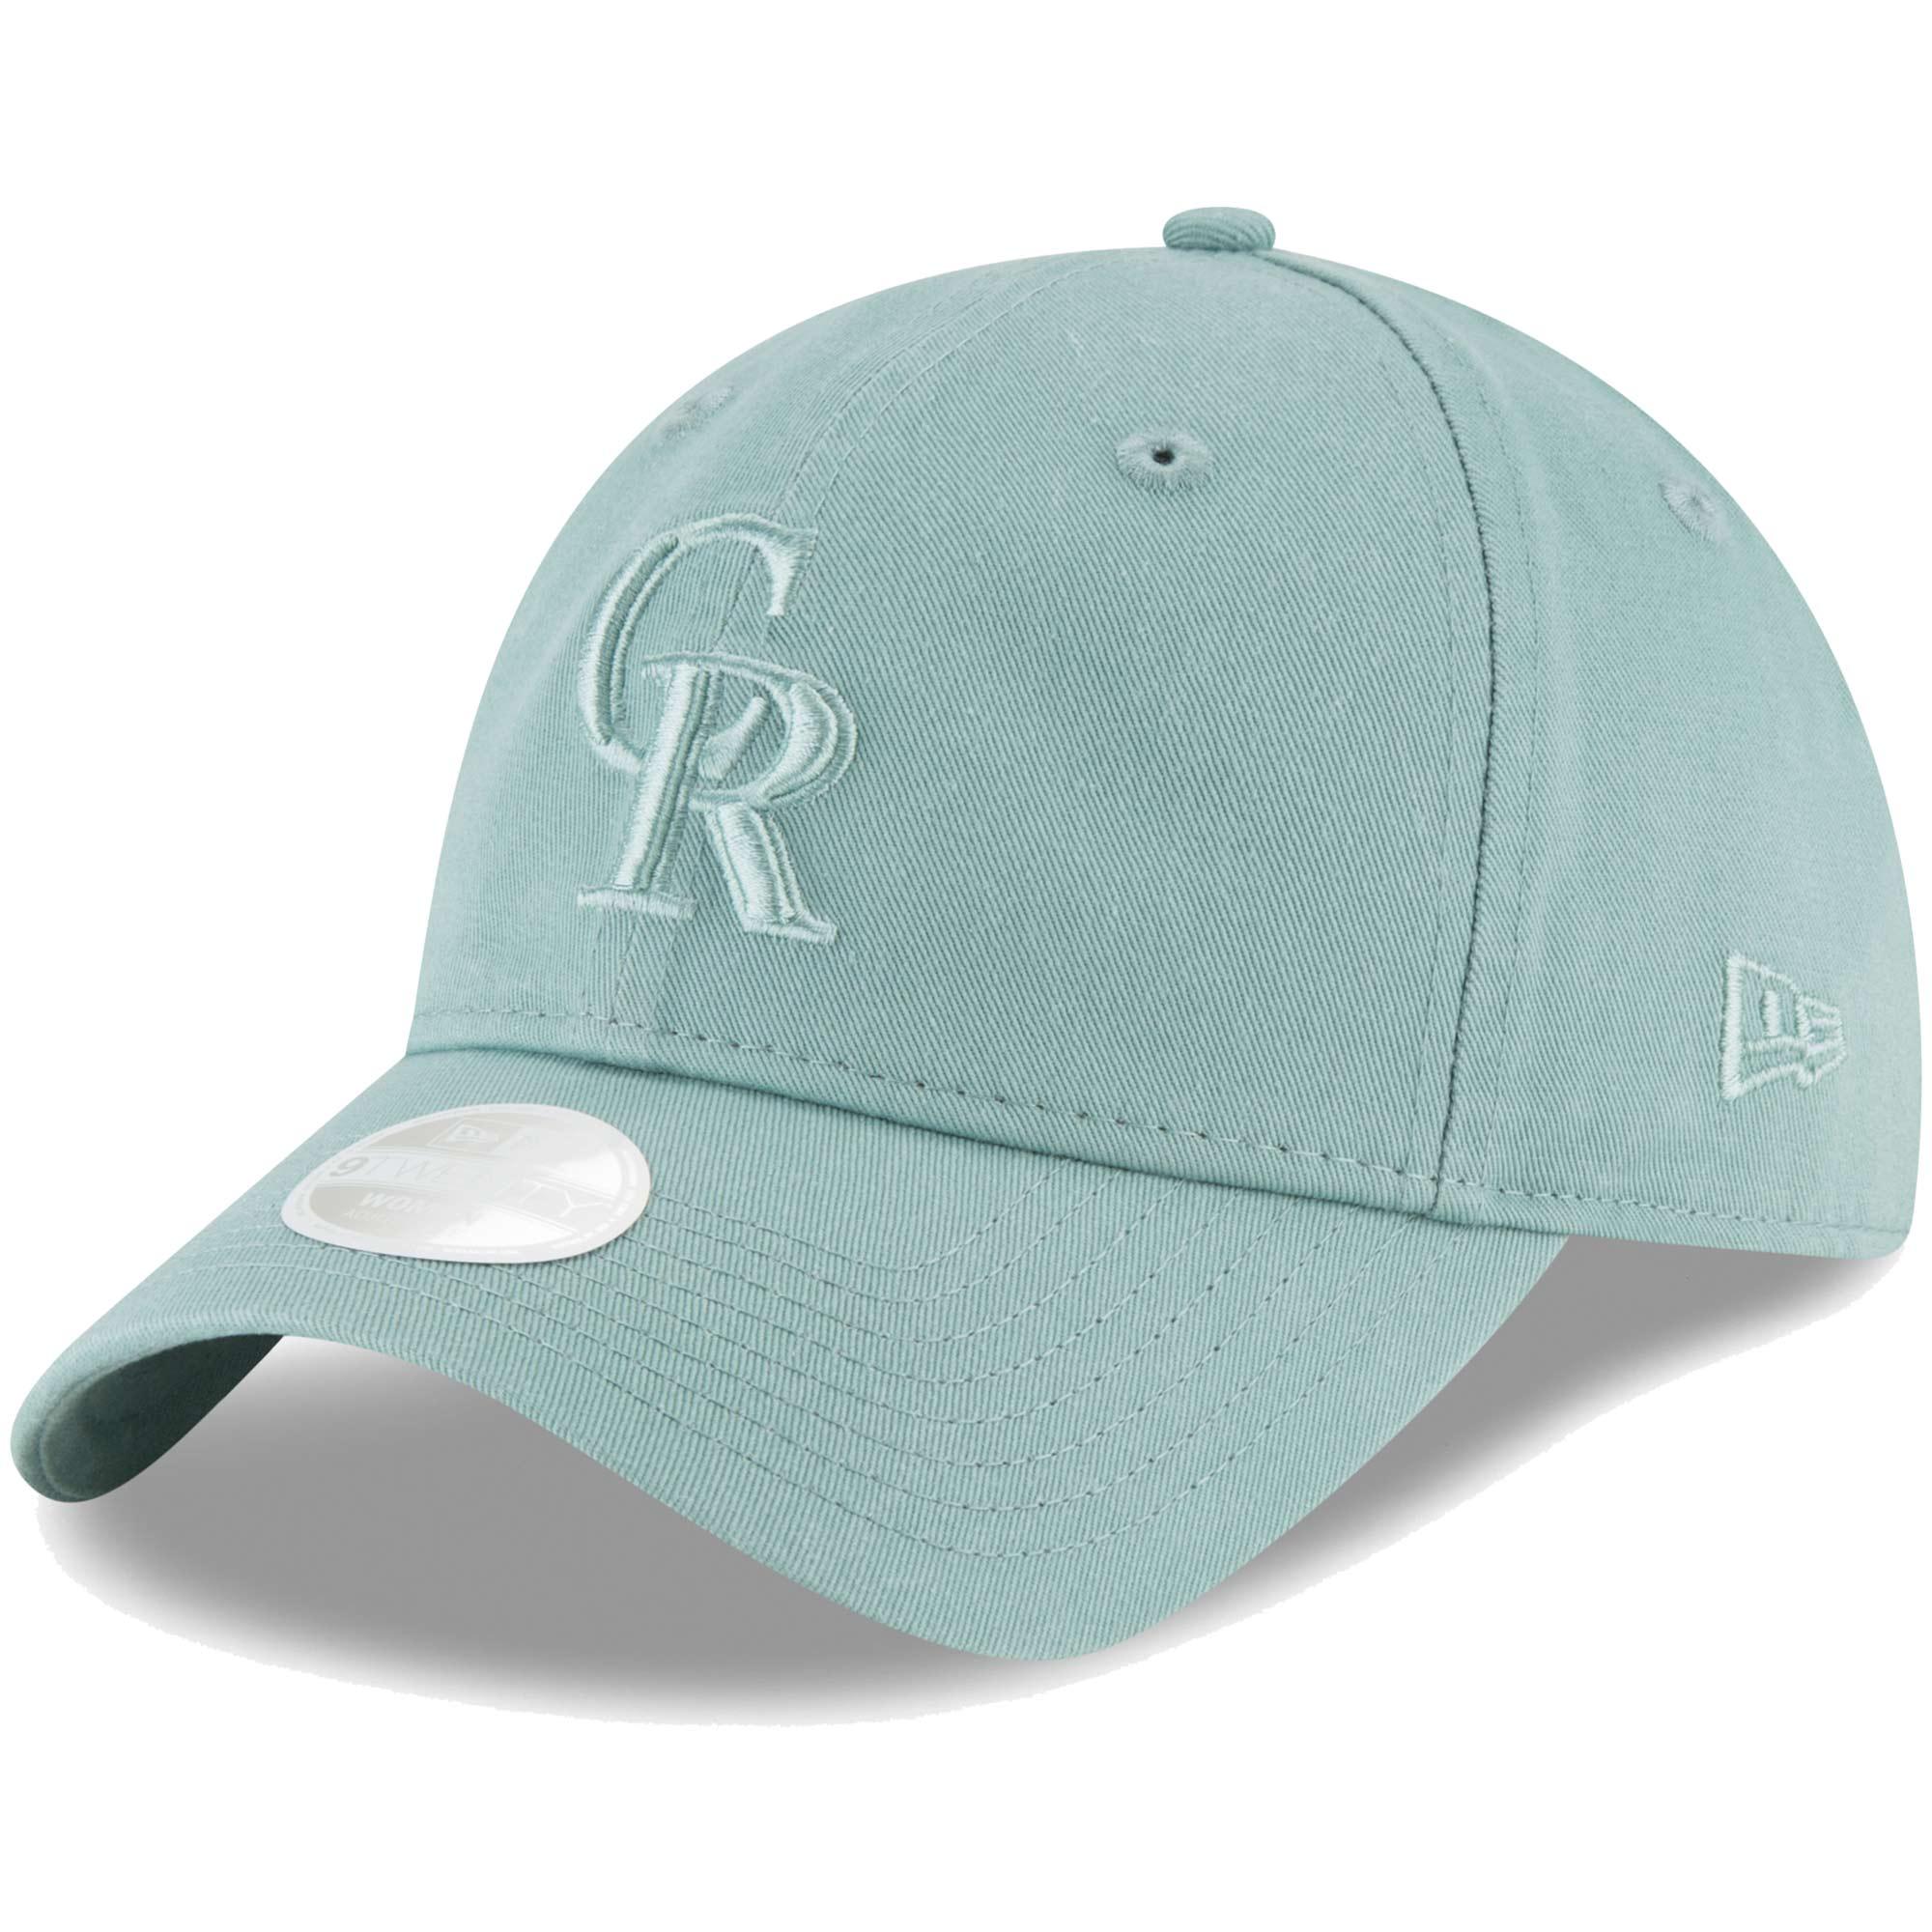 Colorado Rockies New Era Women's Core Classic Twill 9TWENTY Adjustable Hat - Light Blue - OSFA